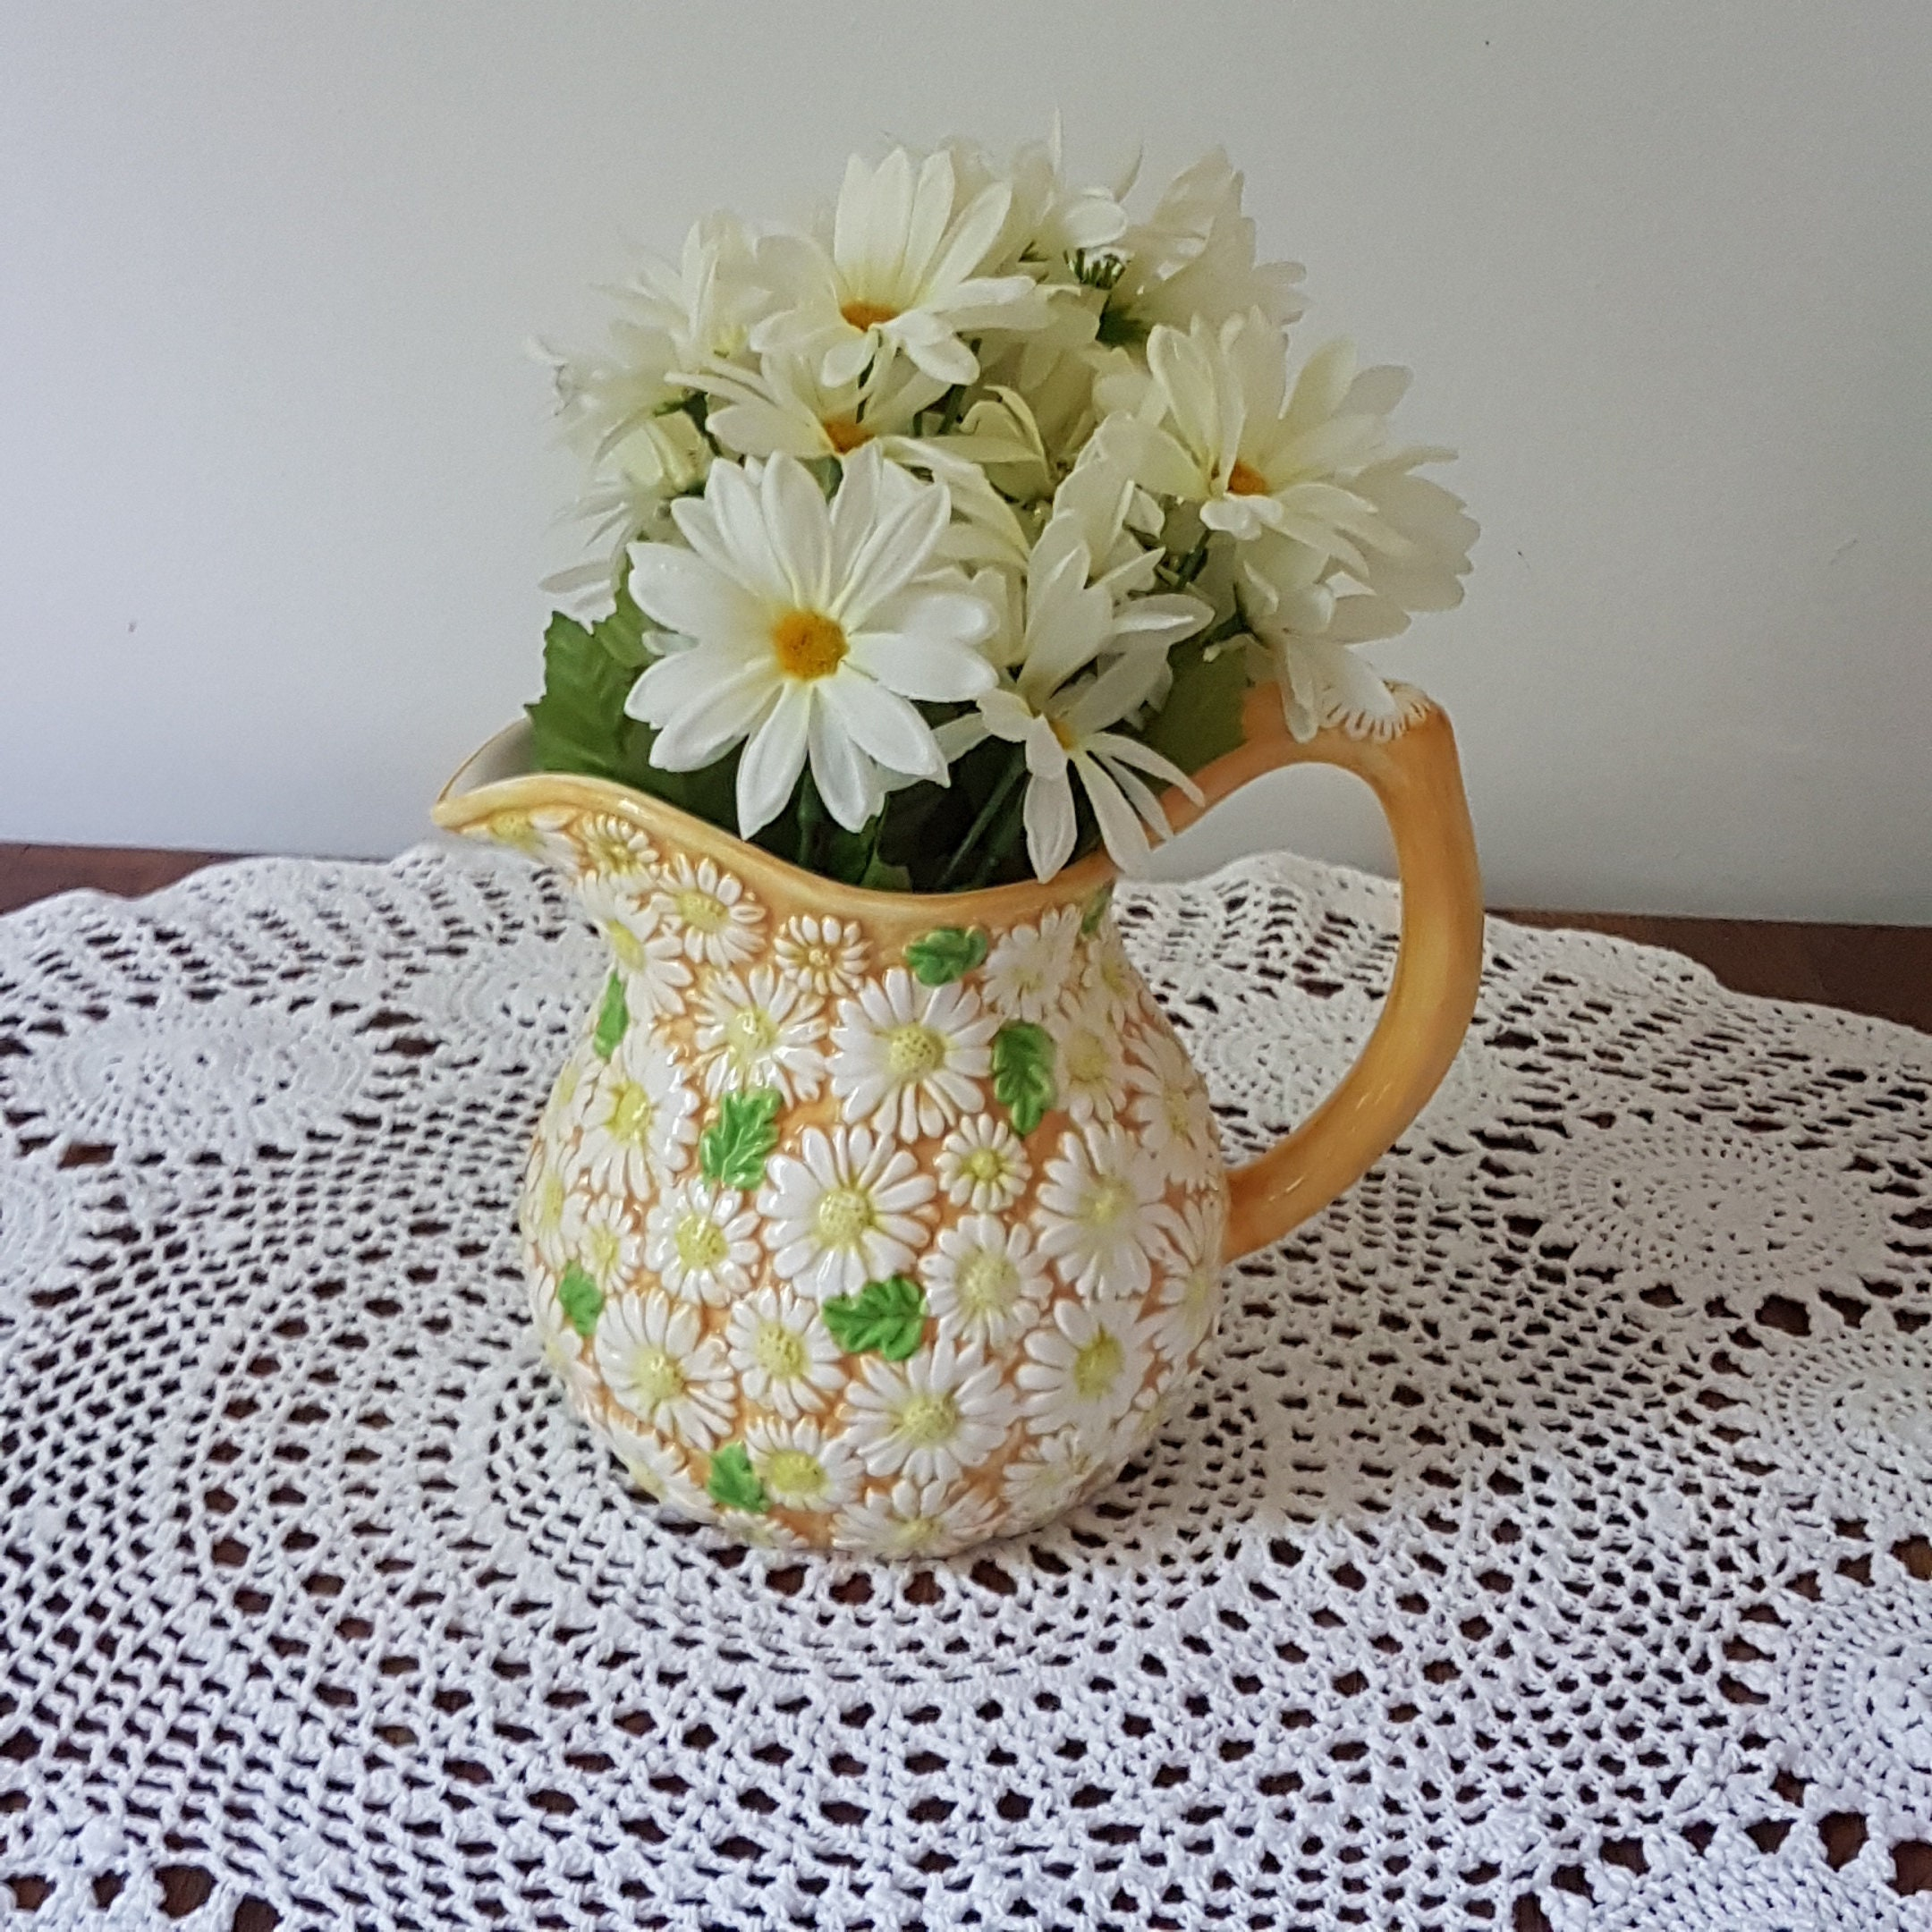 Daisy Kitchen Decor: White Daisy Flower Pitcher, Lemonade Jug, Sangrai Pitcher